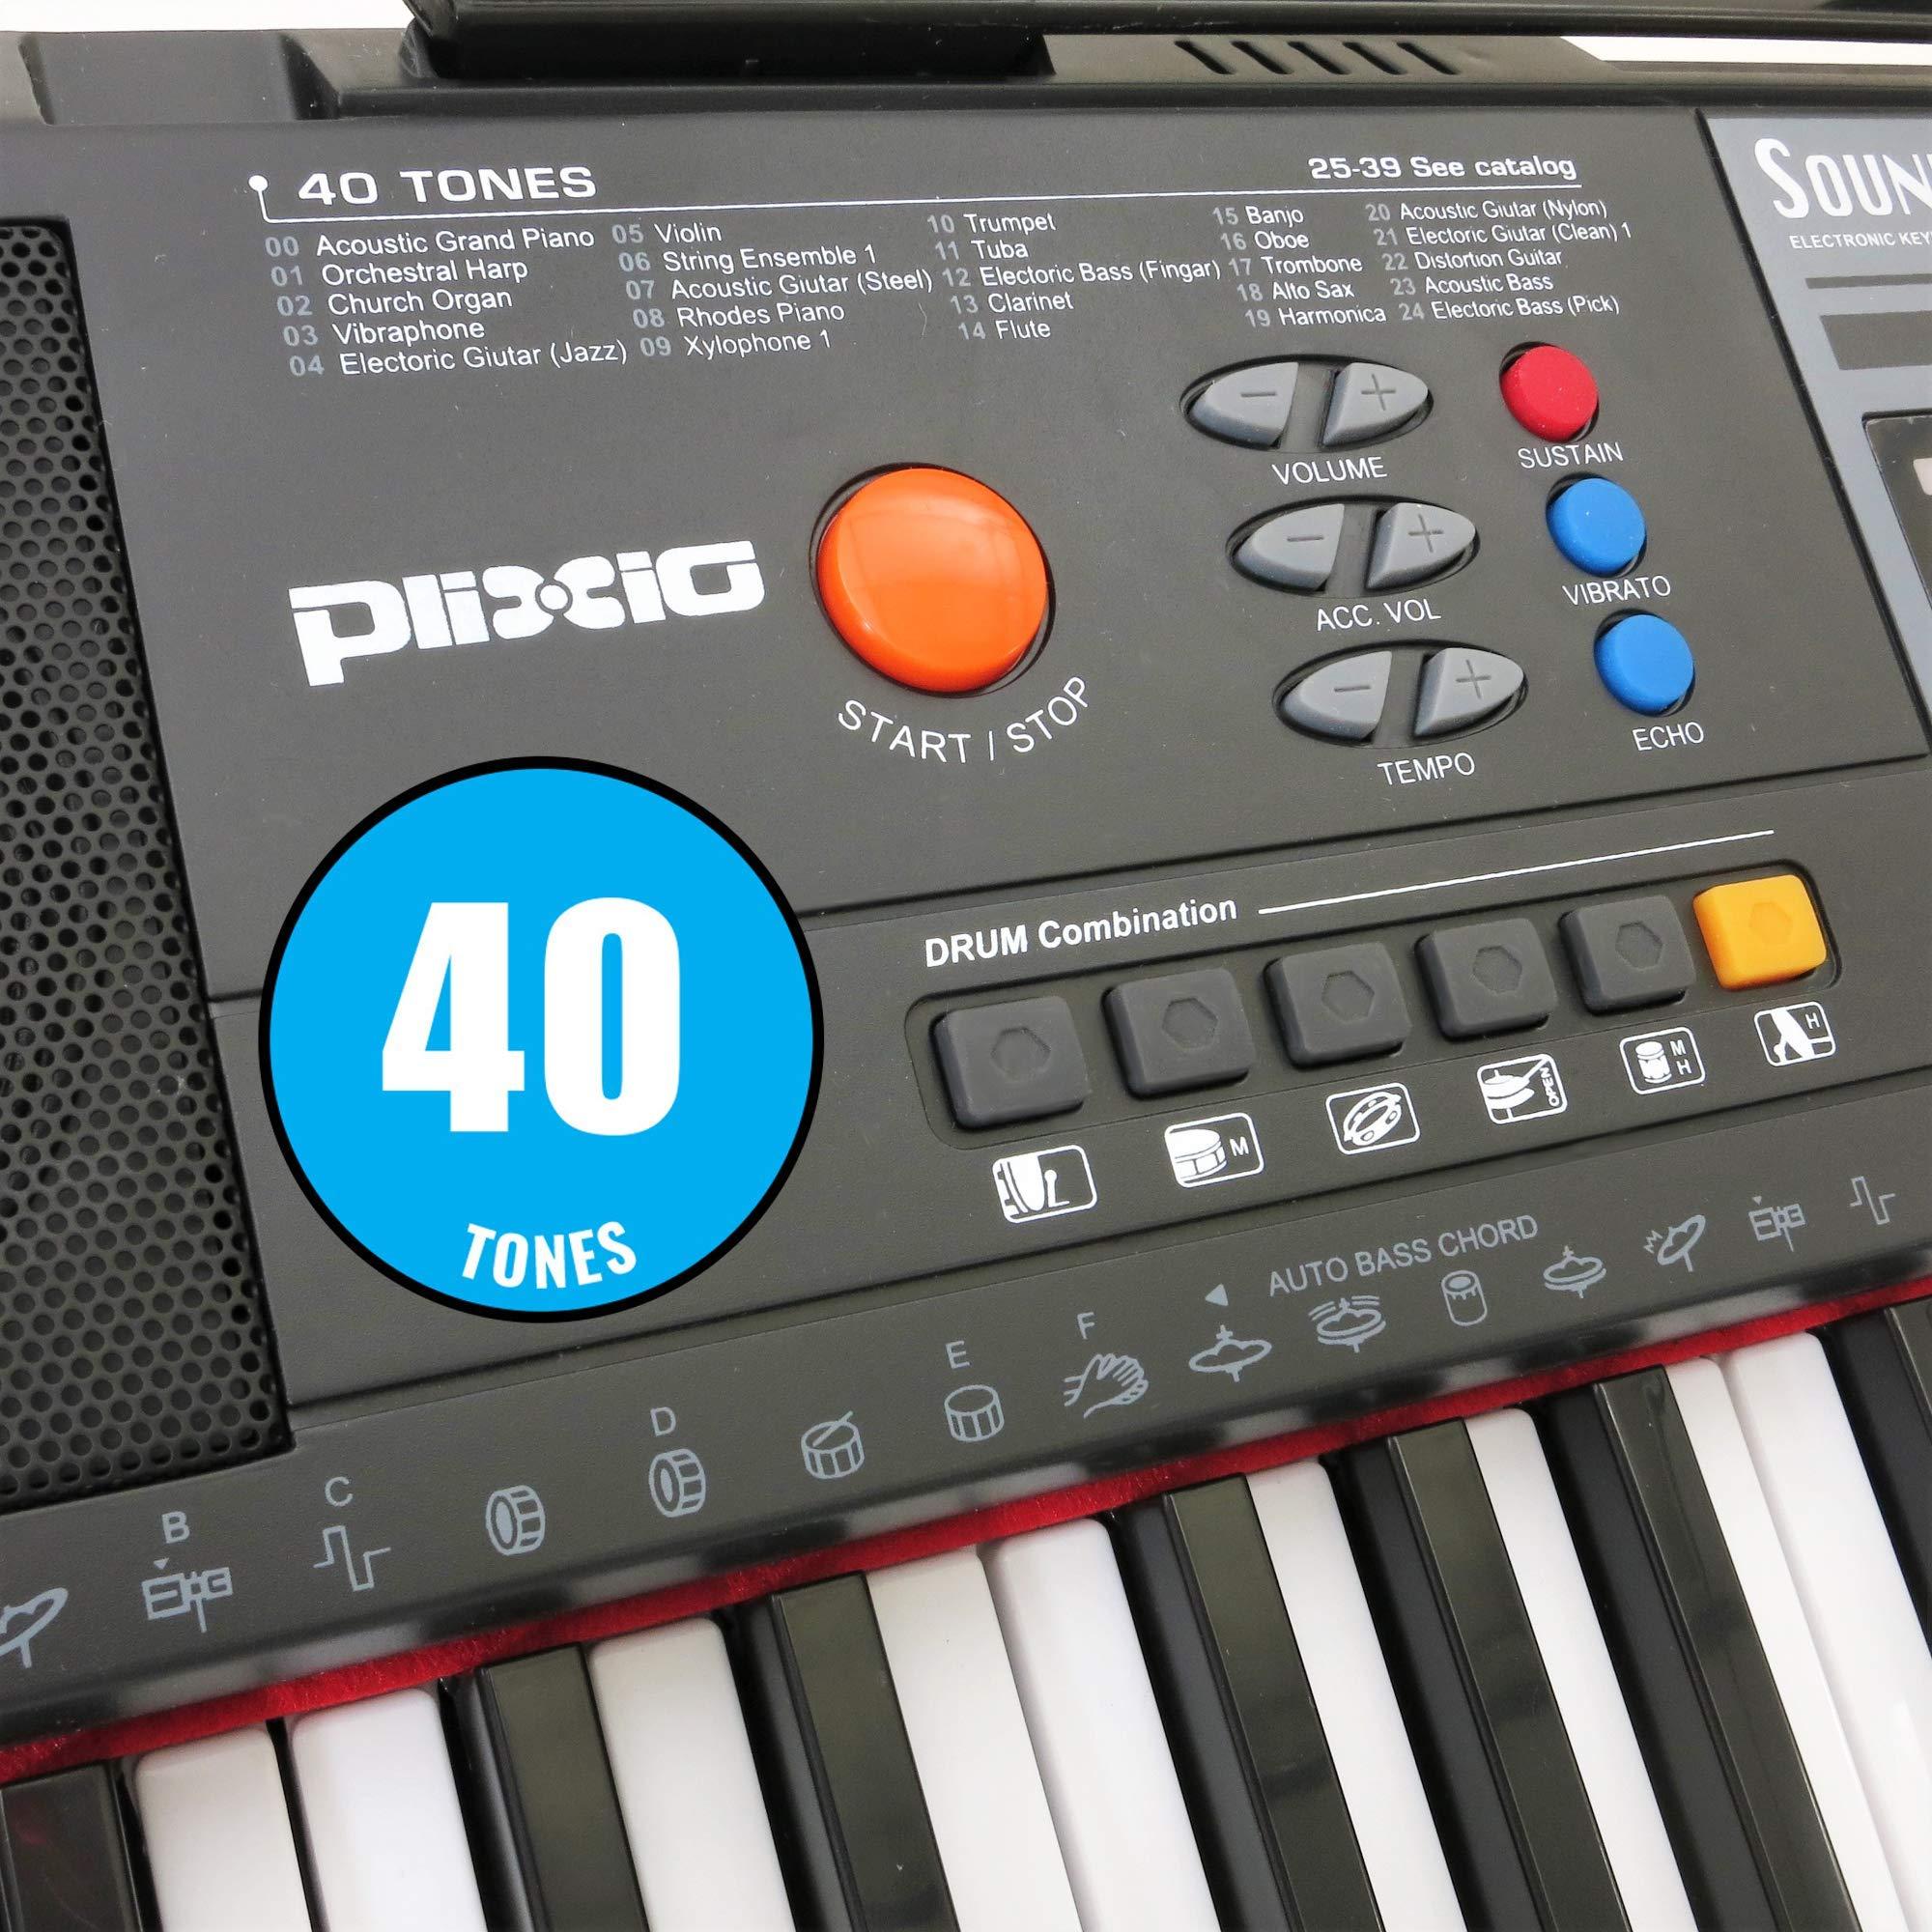 Plixio 61-Key Digital Electric Piano Keyboard & Sheet Music Stand - Portable Electronic Keyboard for Beginners (Kids & Adults) (Renewed) by Plixio (Image #2)